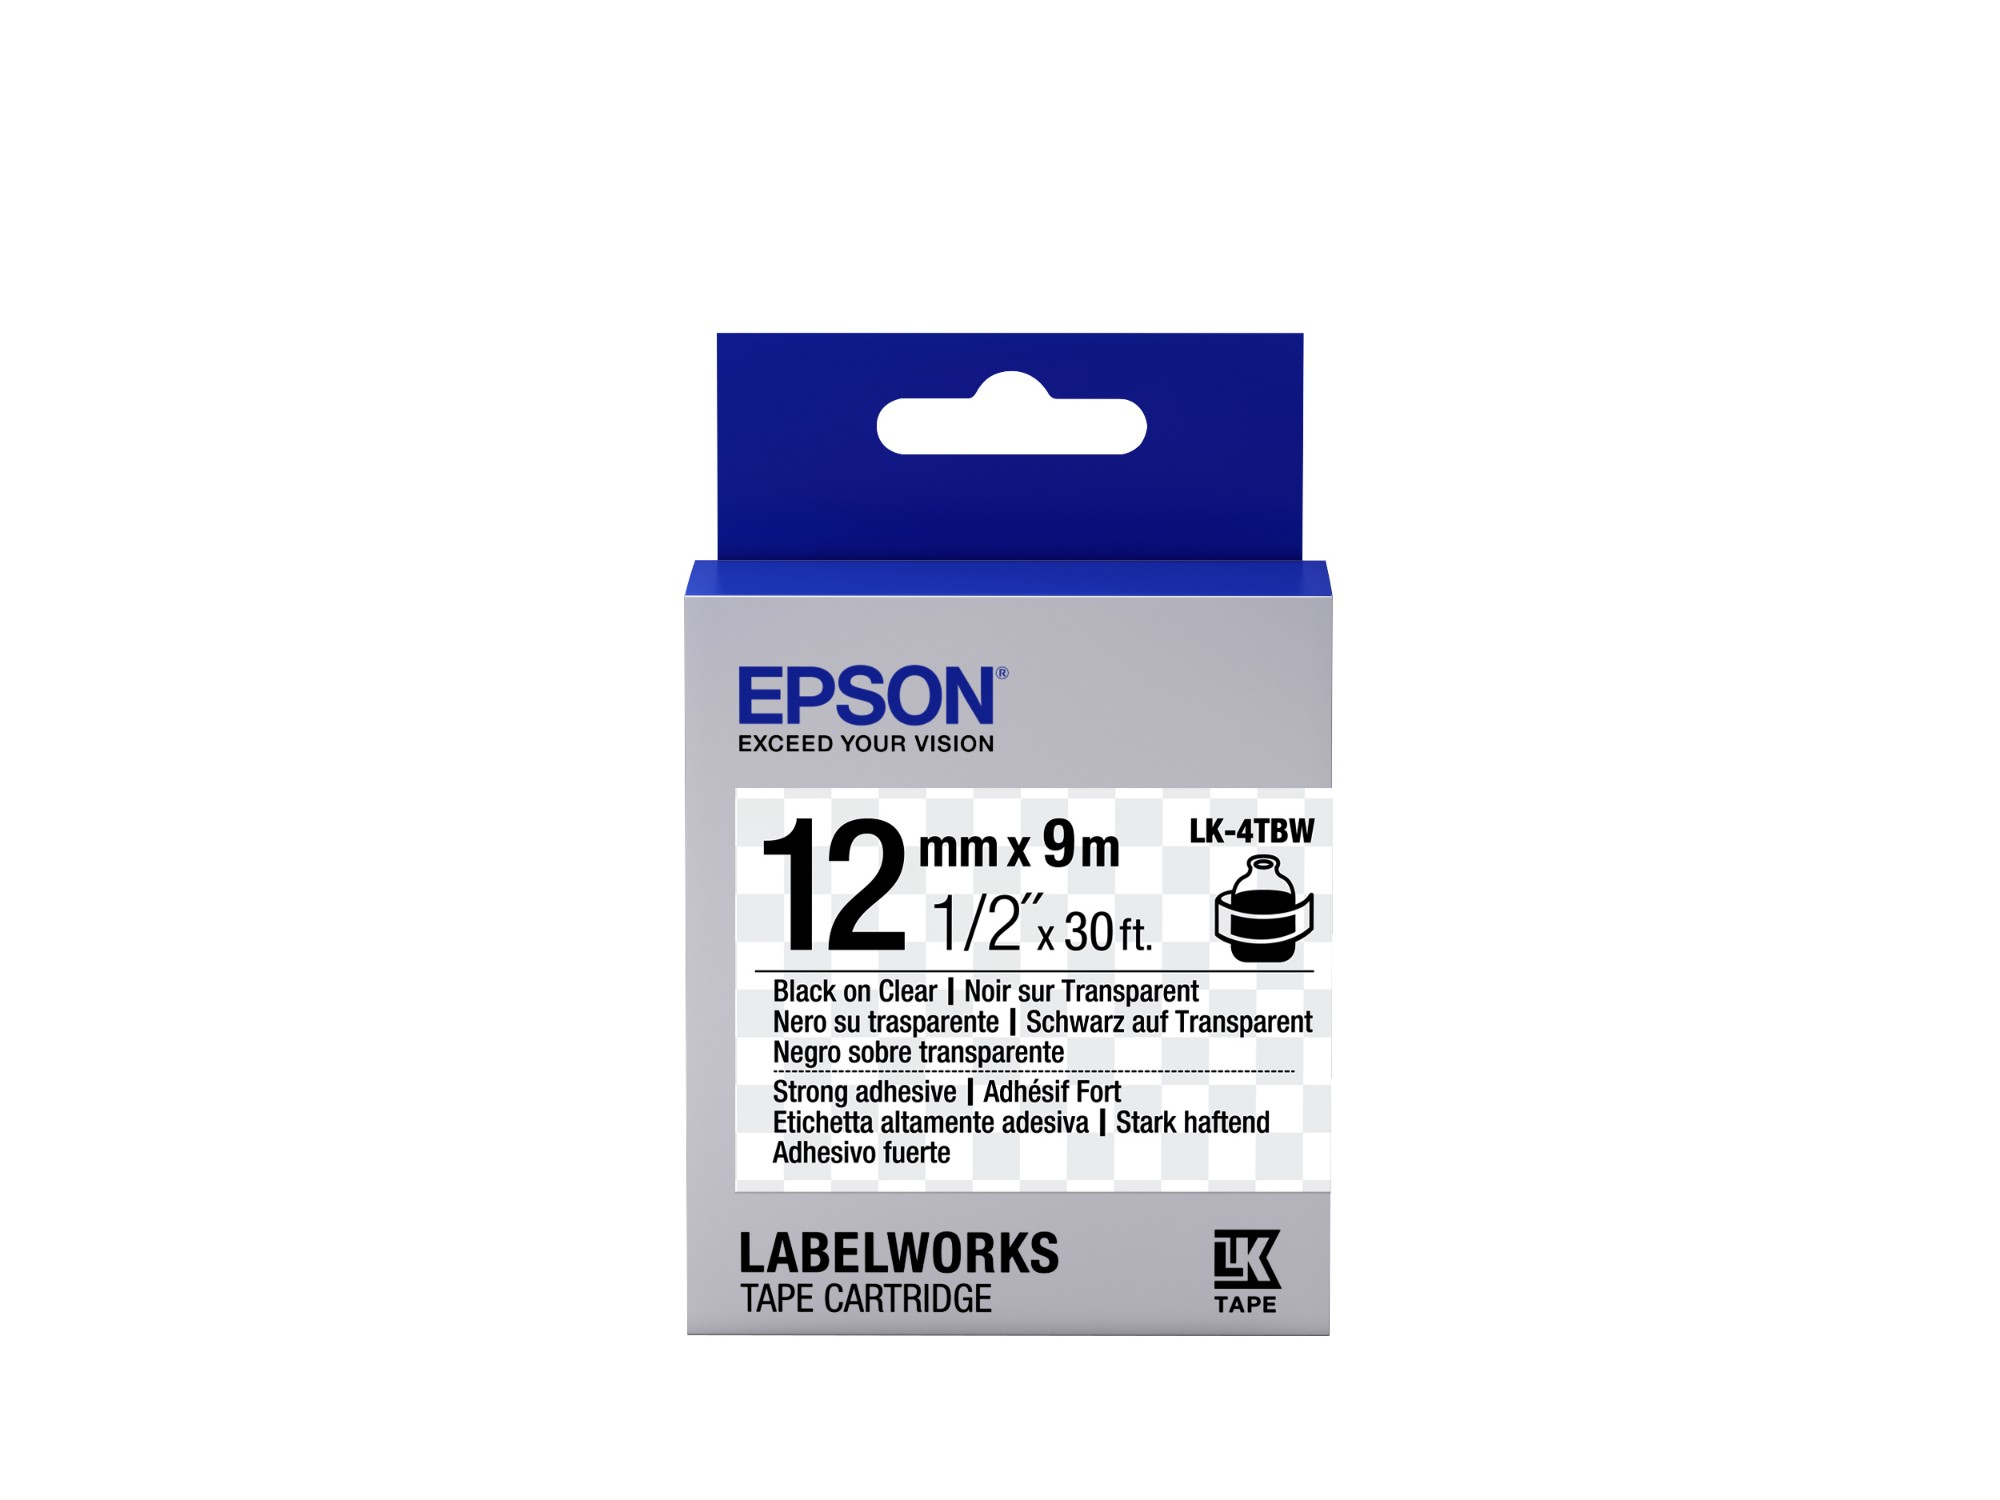 Epson C53S654015 (LK-4TBW) Ribbon, 12mm x 9m